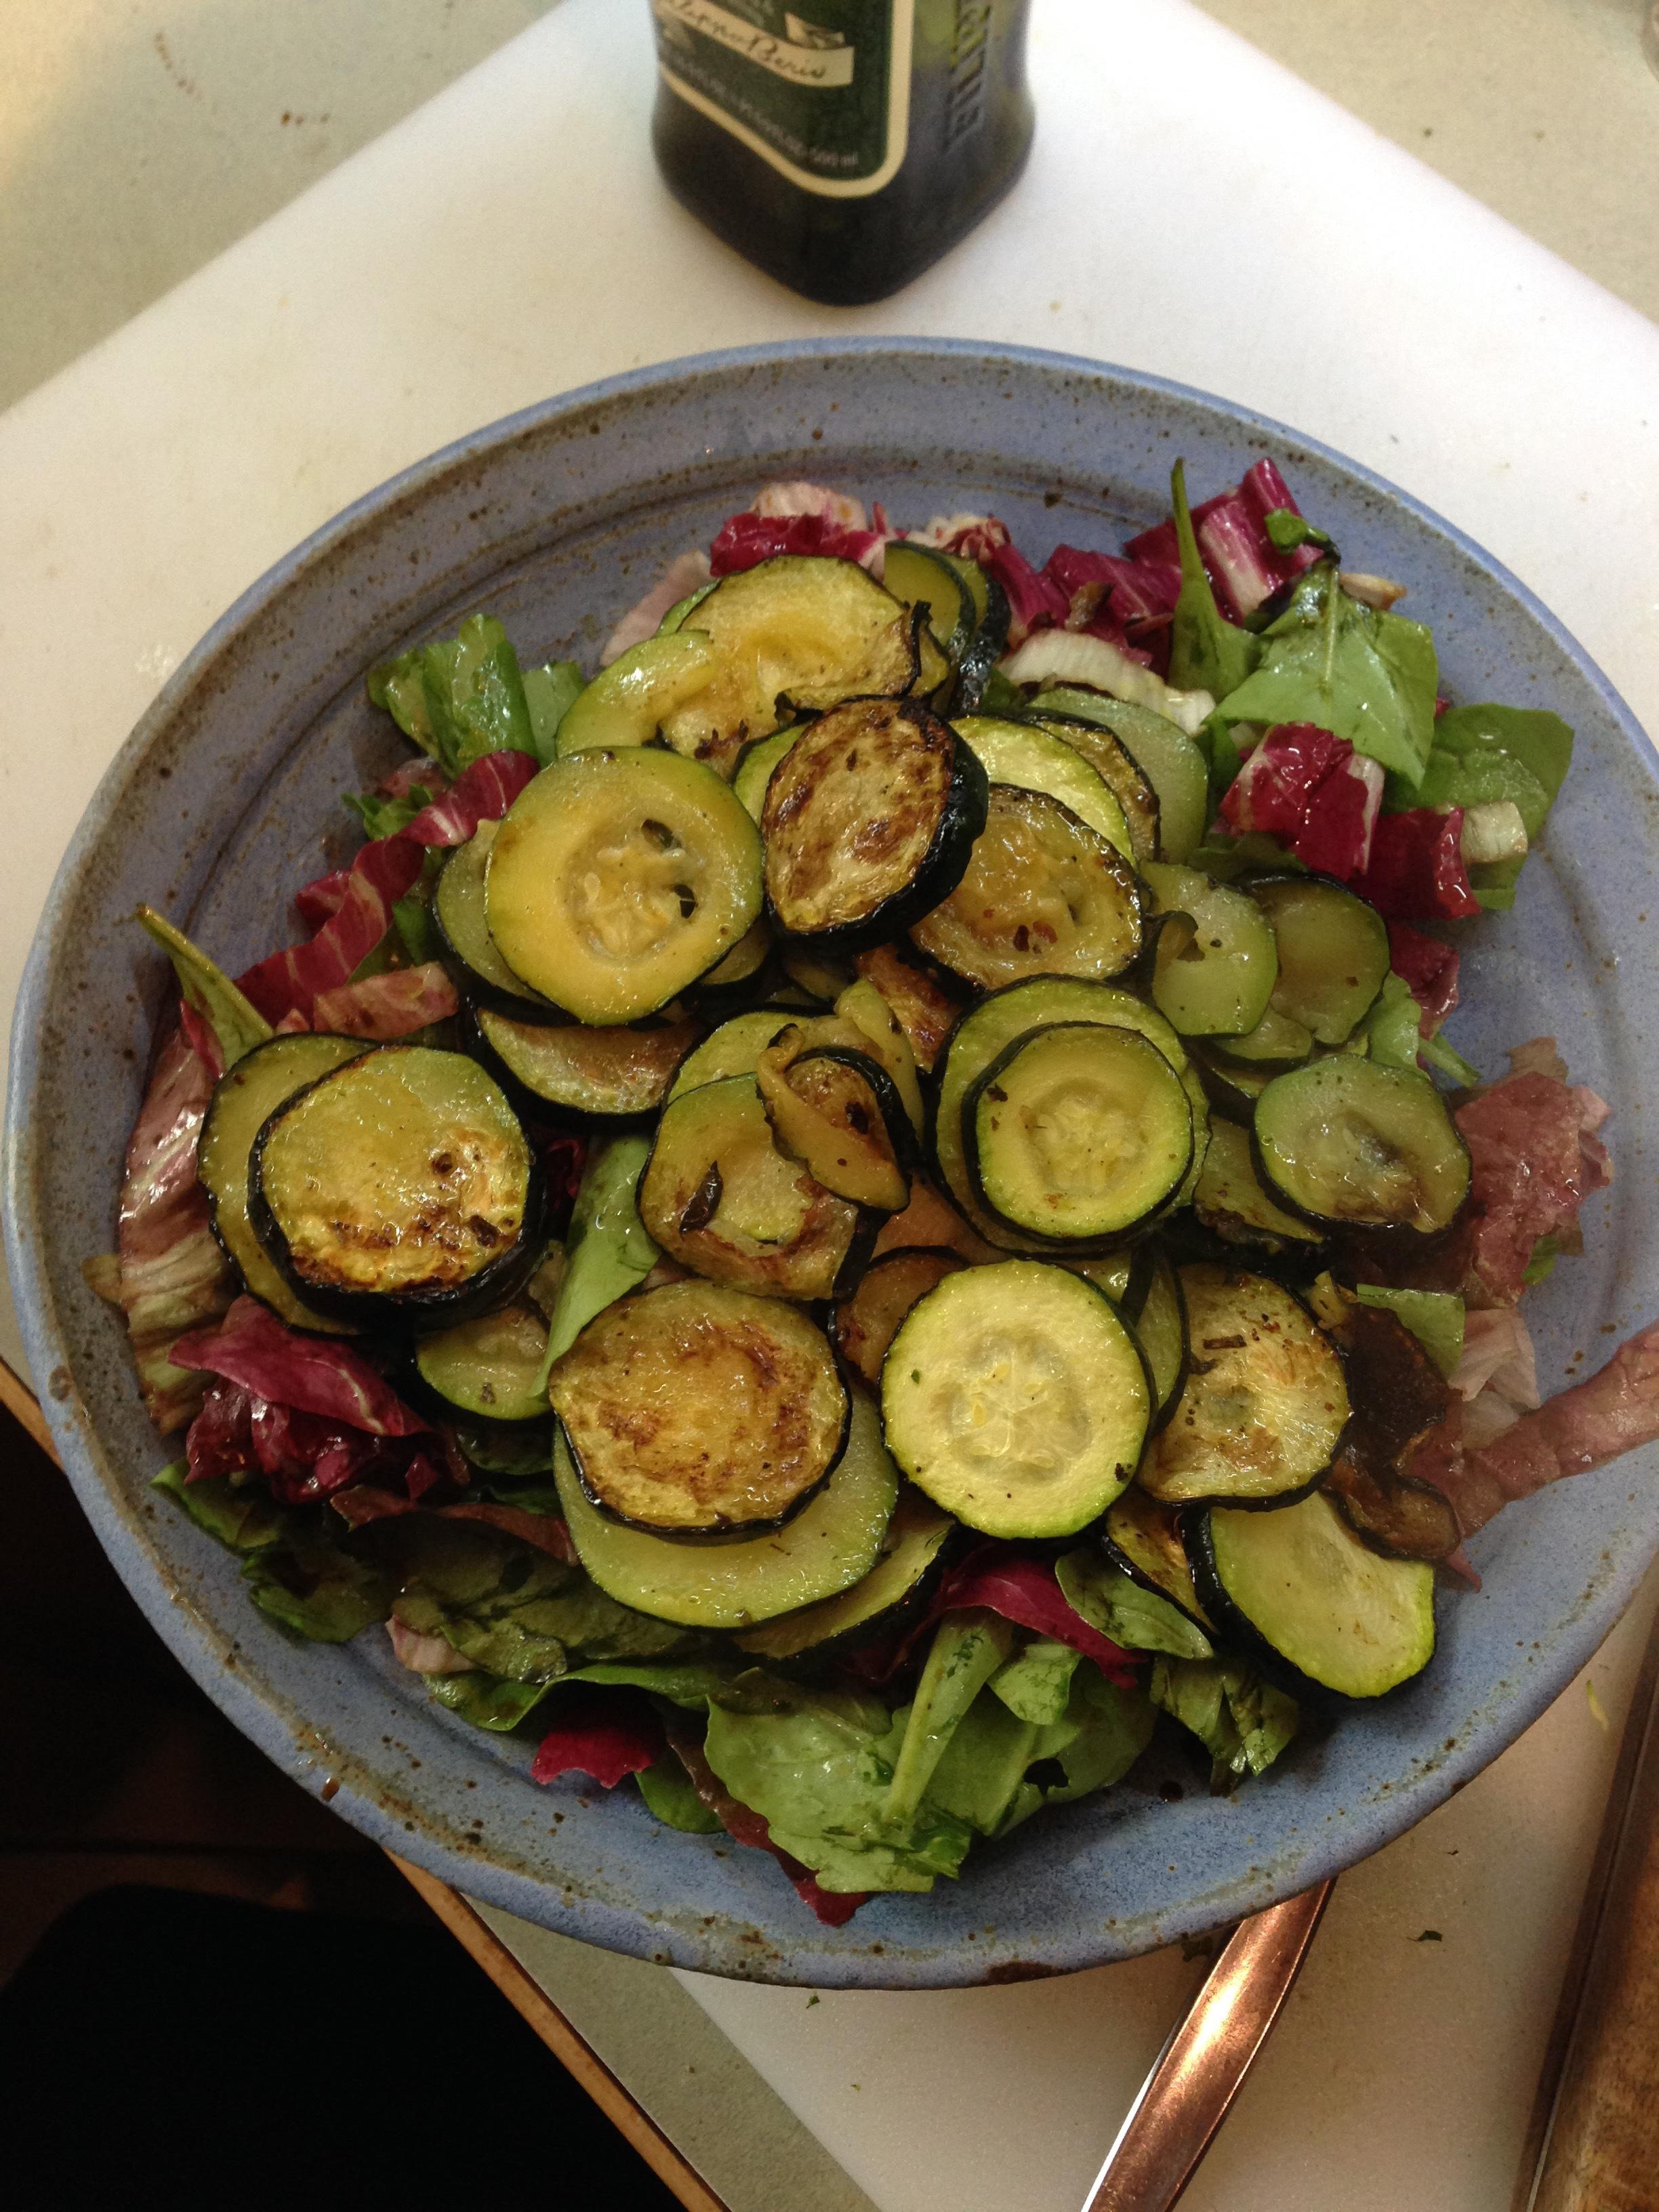 oven-roasted zucchini over a salad of arugula and sauted radicchio